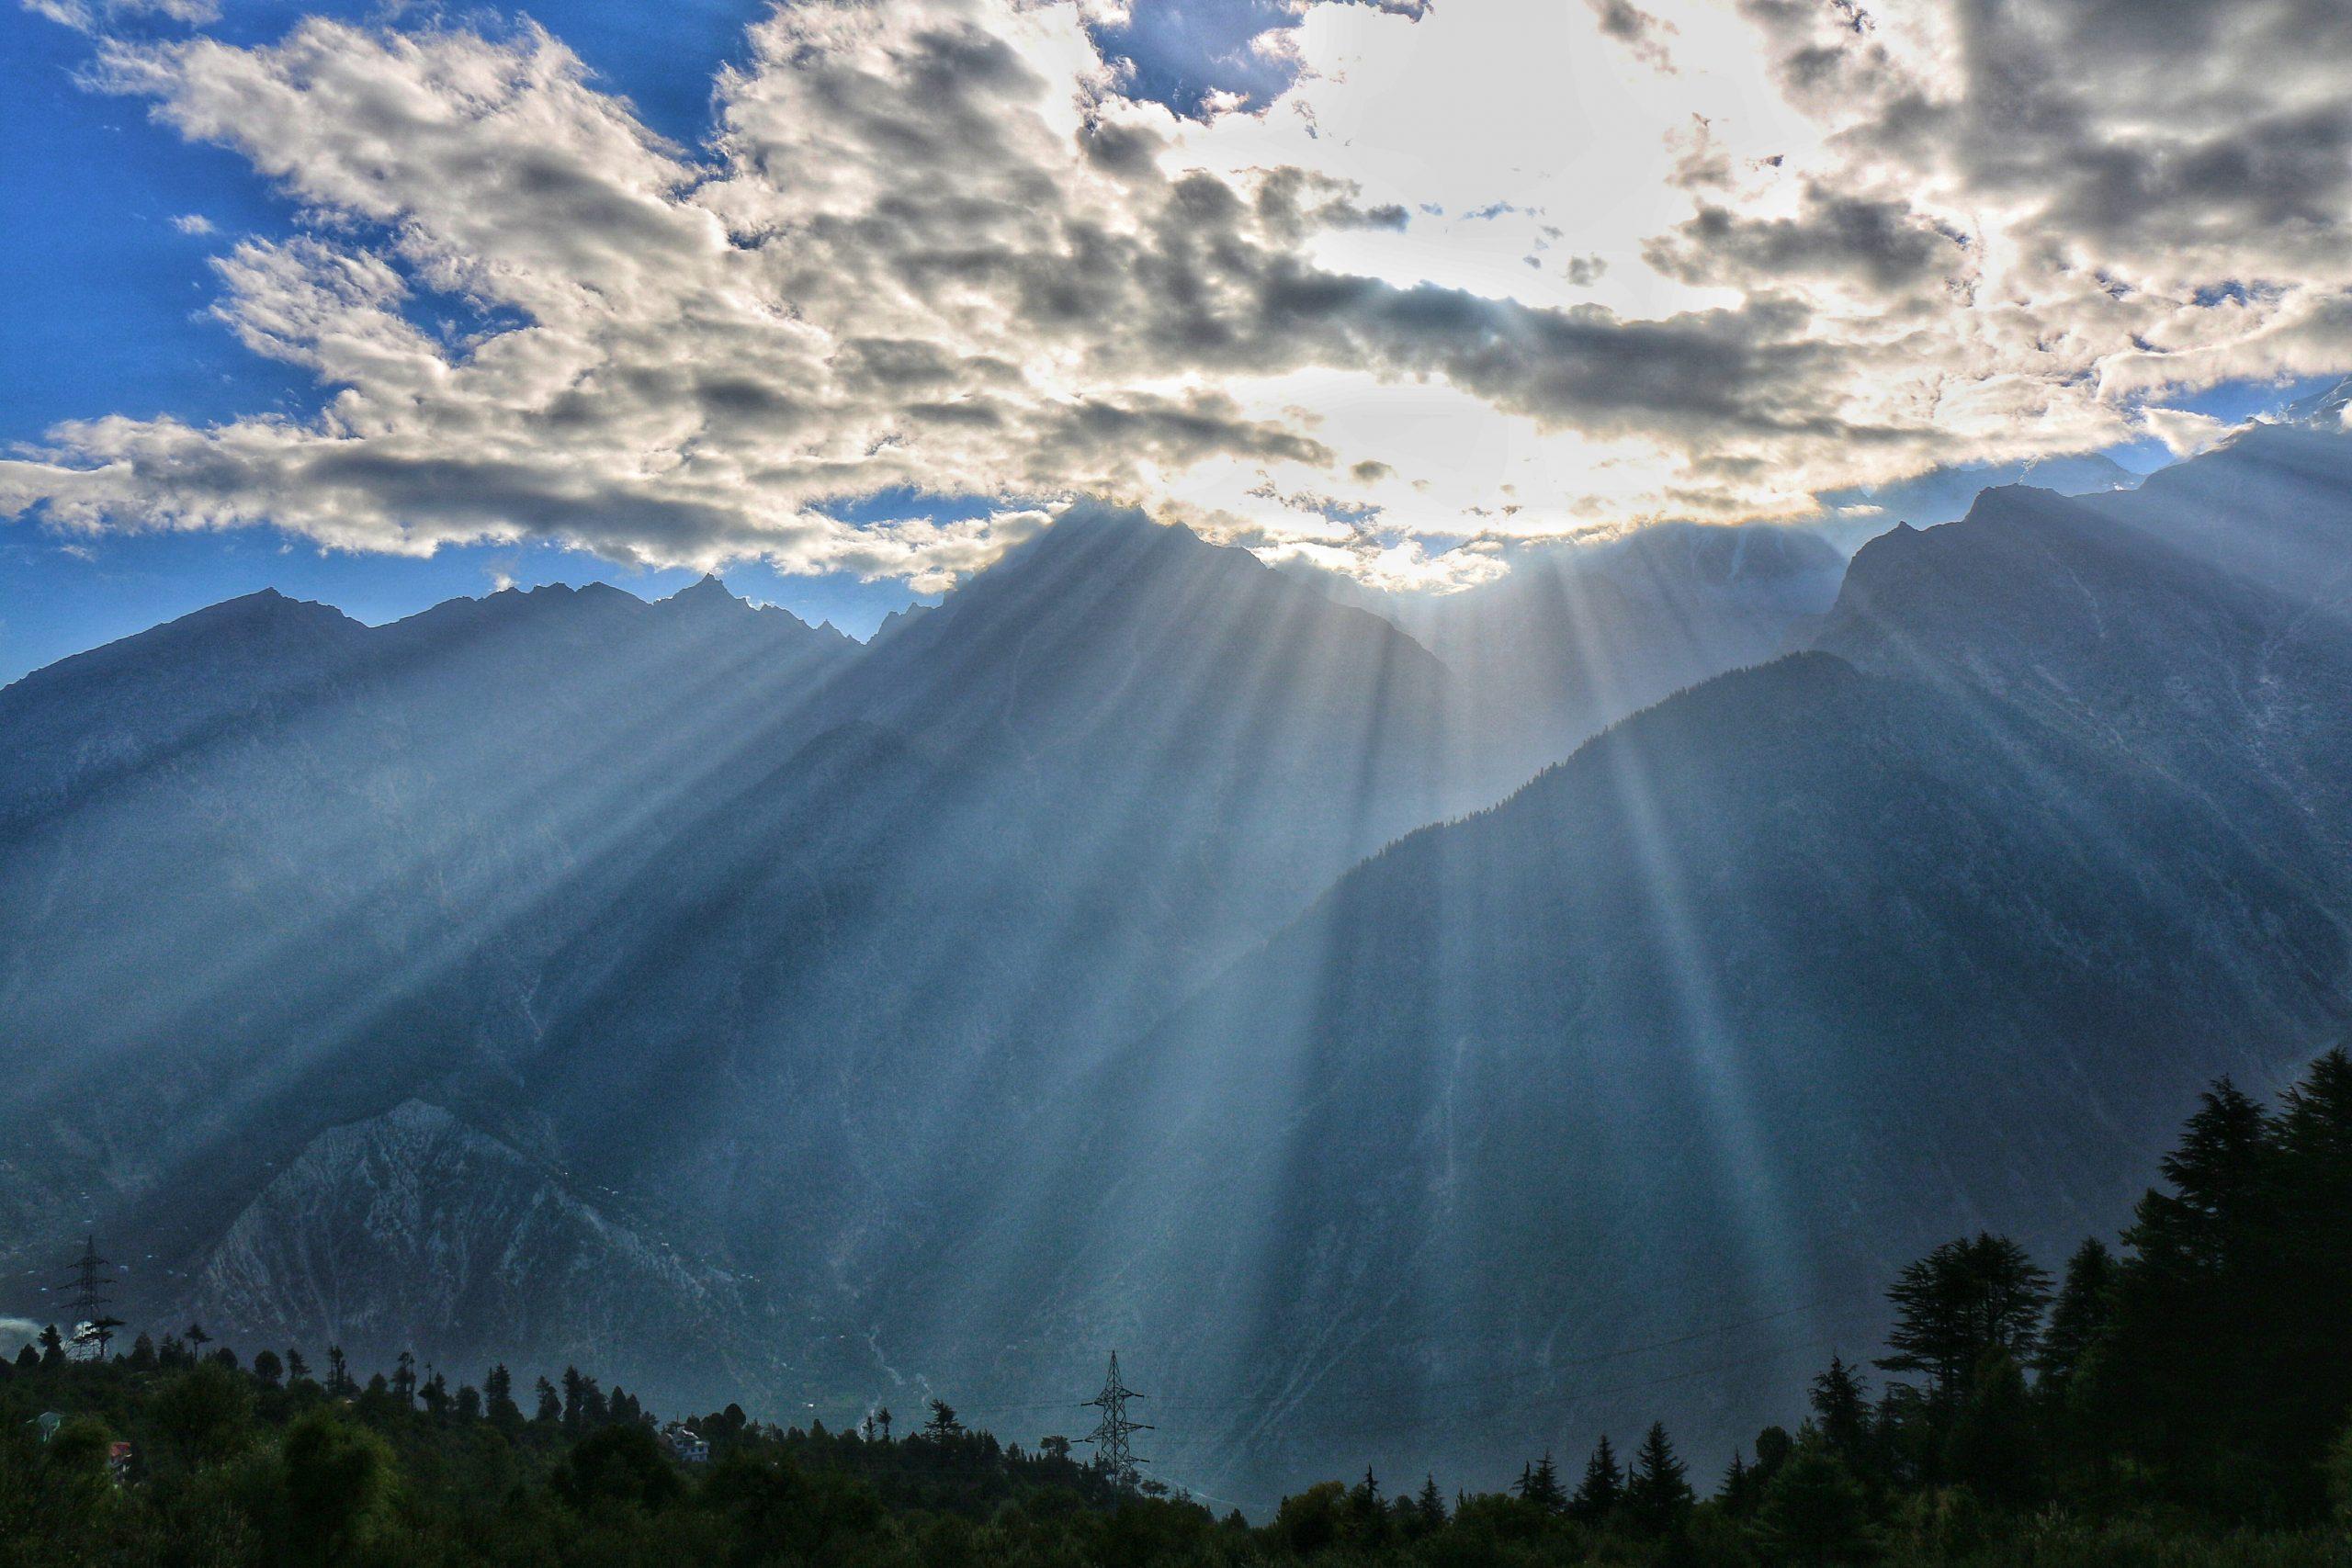 Sunshine breaking through clouds